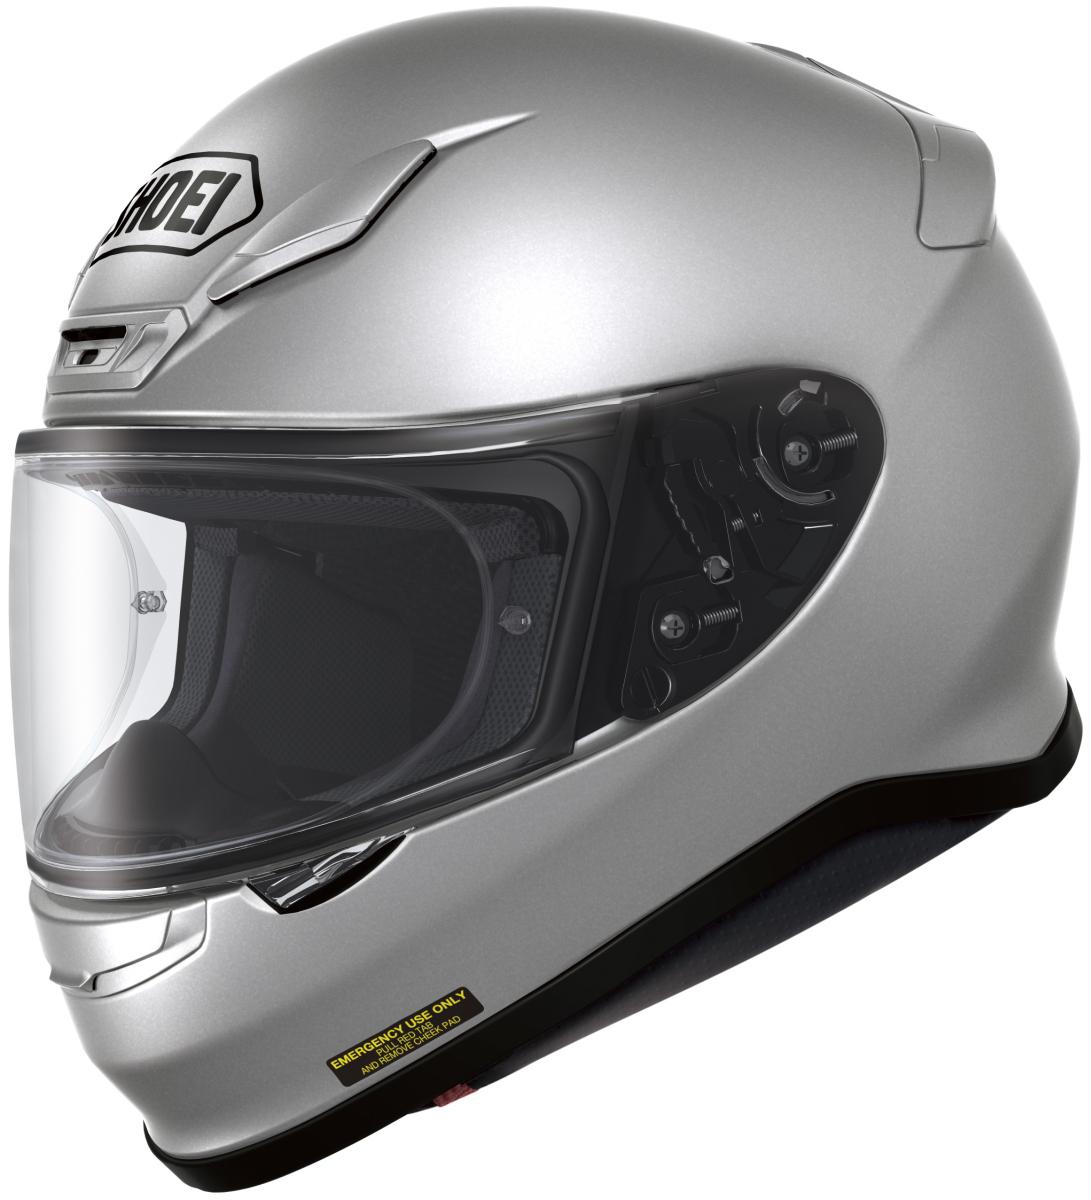 RF1200 METALLC